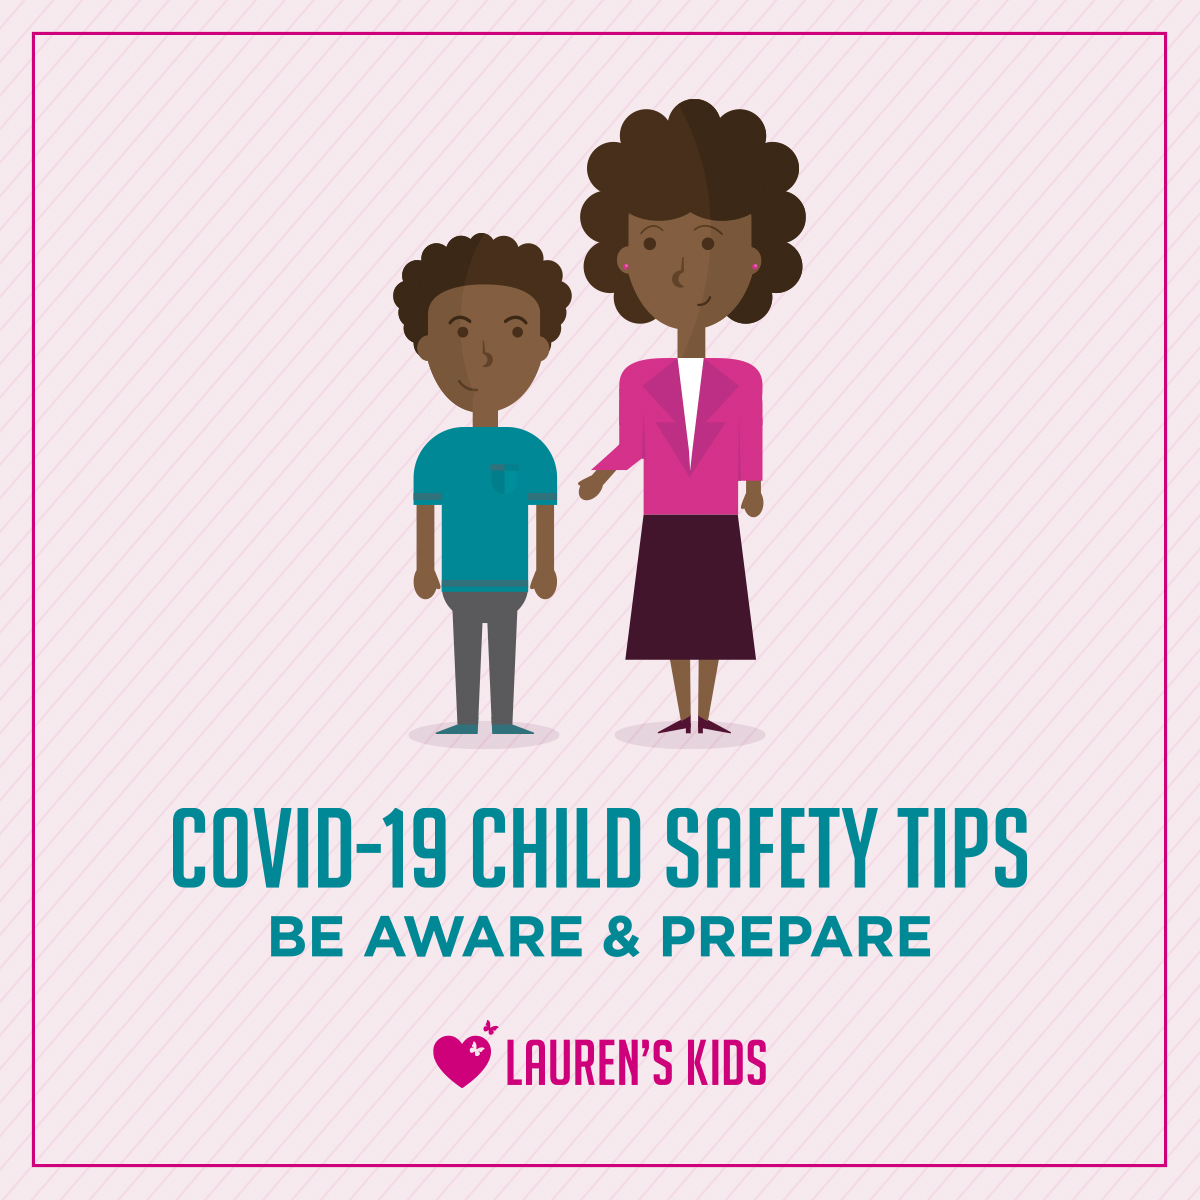 COVID-19 Child Safety Tips – Be Aware & Prepare